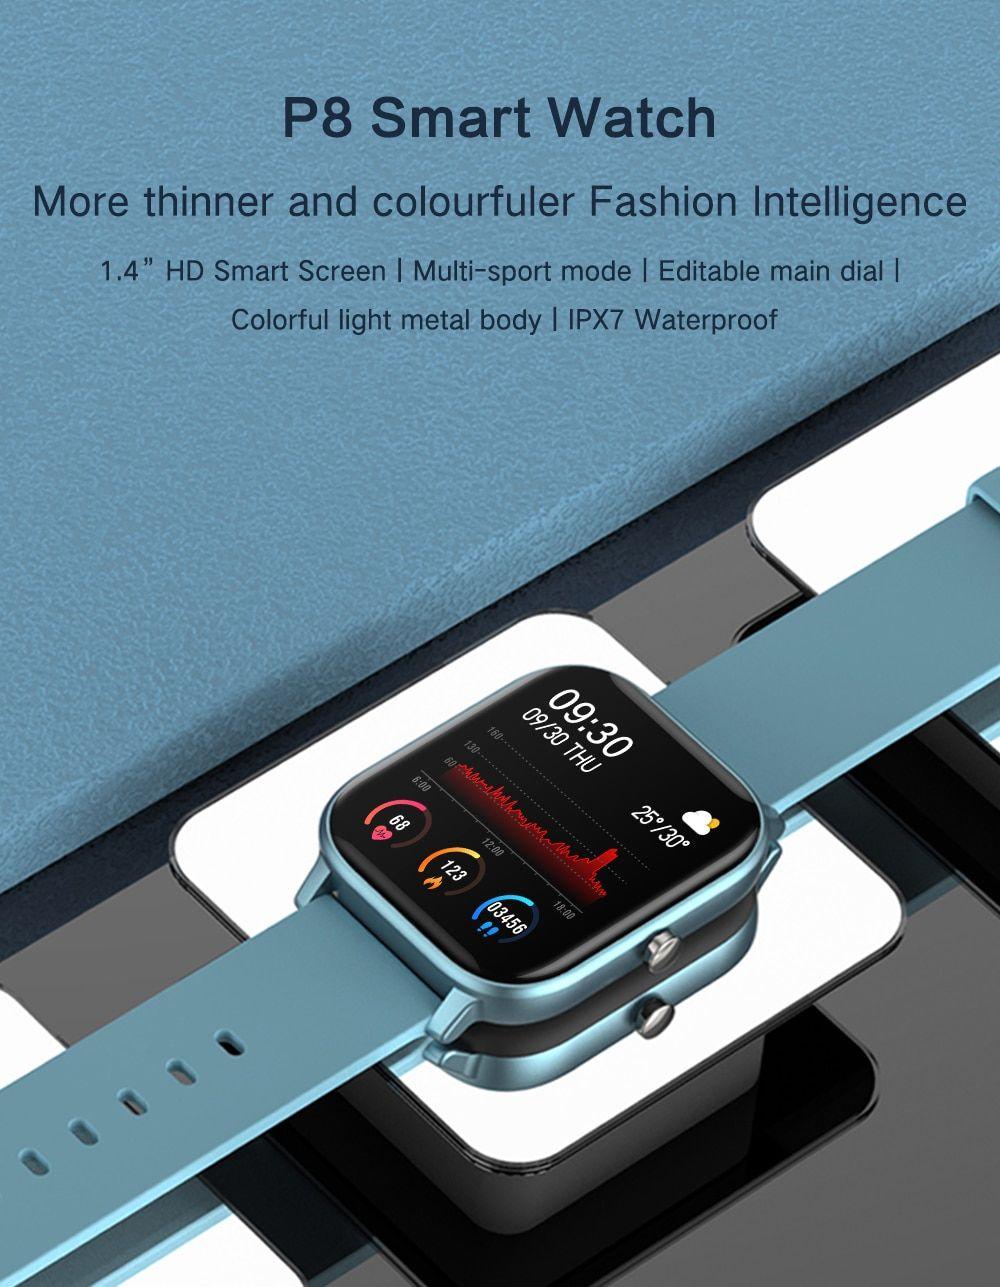 images?q=tbn:ANd9GcQh_l3eQ5xwiPy07kGEXjmjgmBKBRB7H2mRxCGhv1tFWg5c_mWT Smartwatch D 30